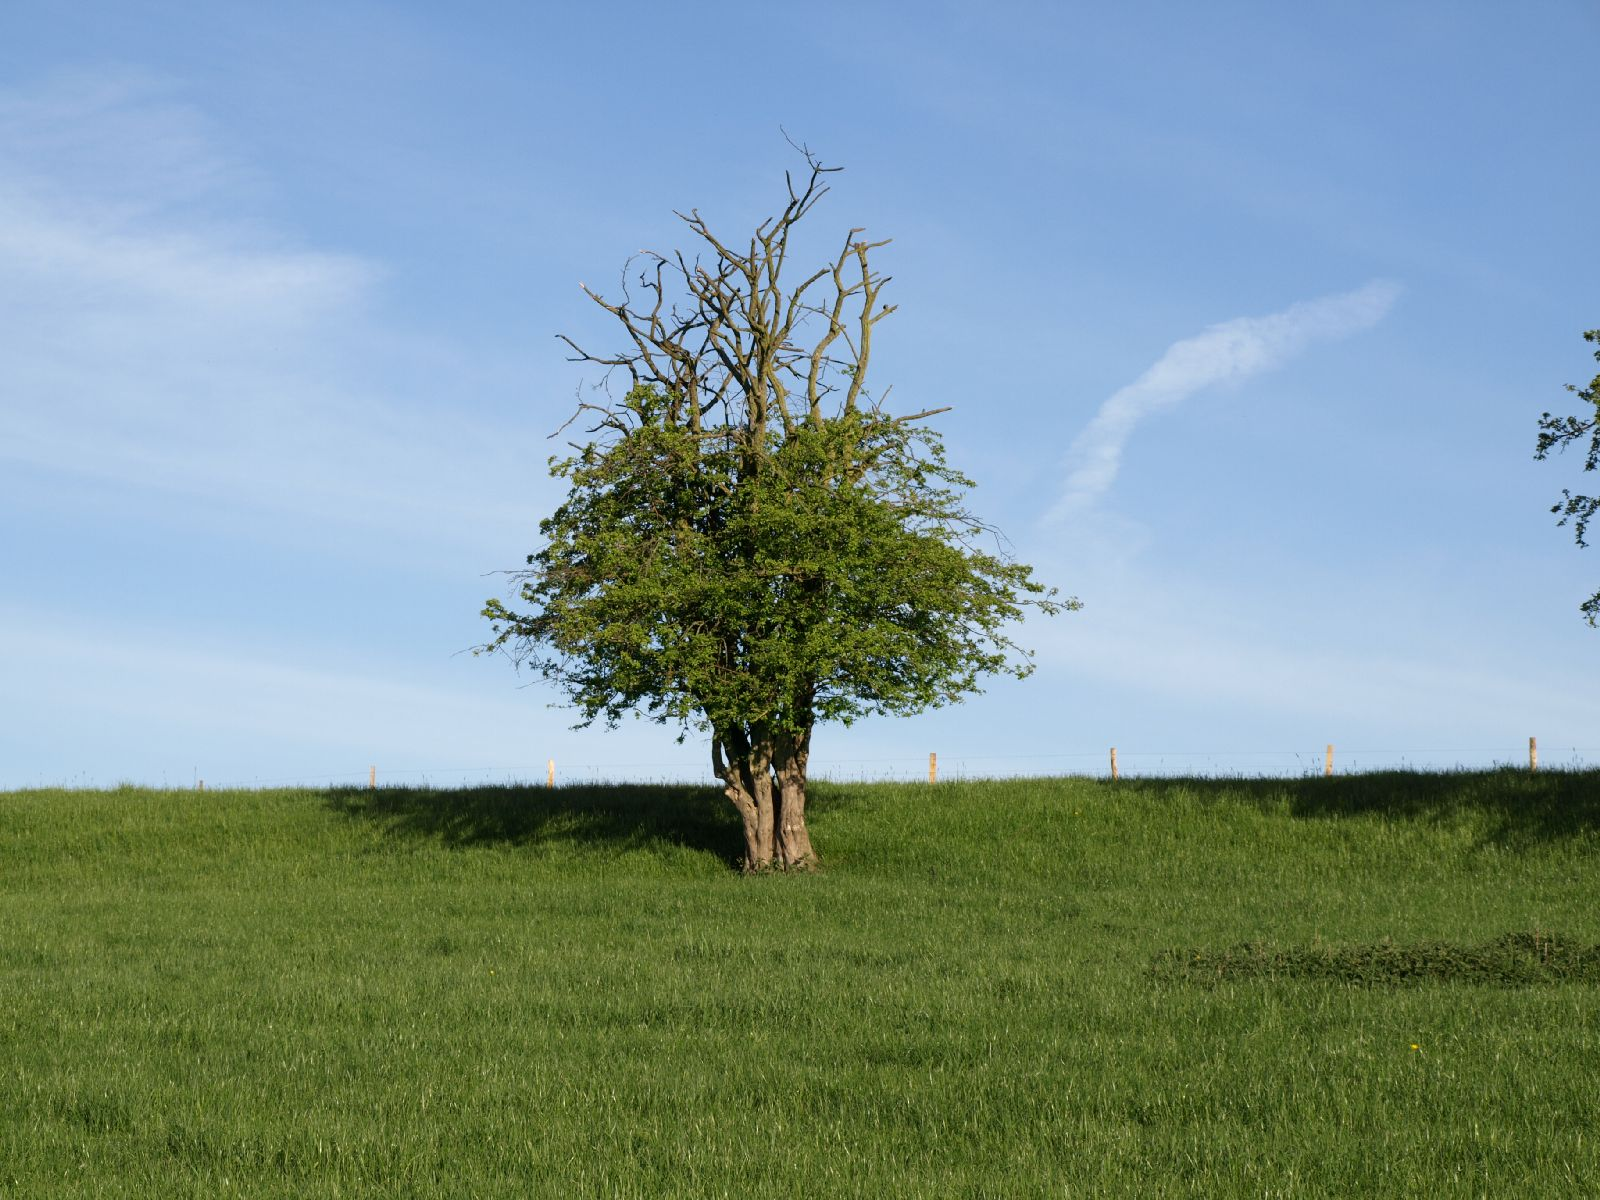 Pflanzen-Baum-Foto_Textur_B_P5052512